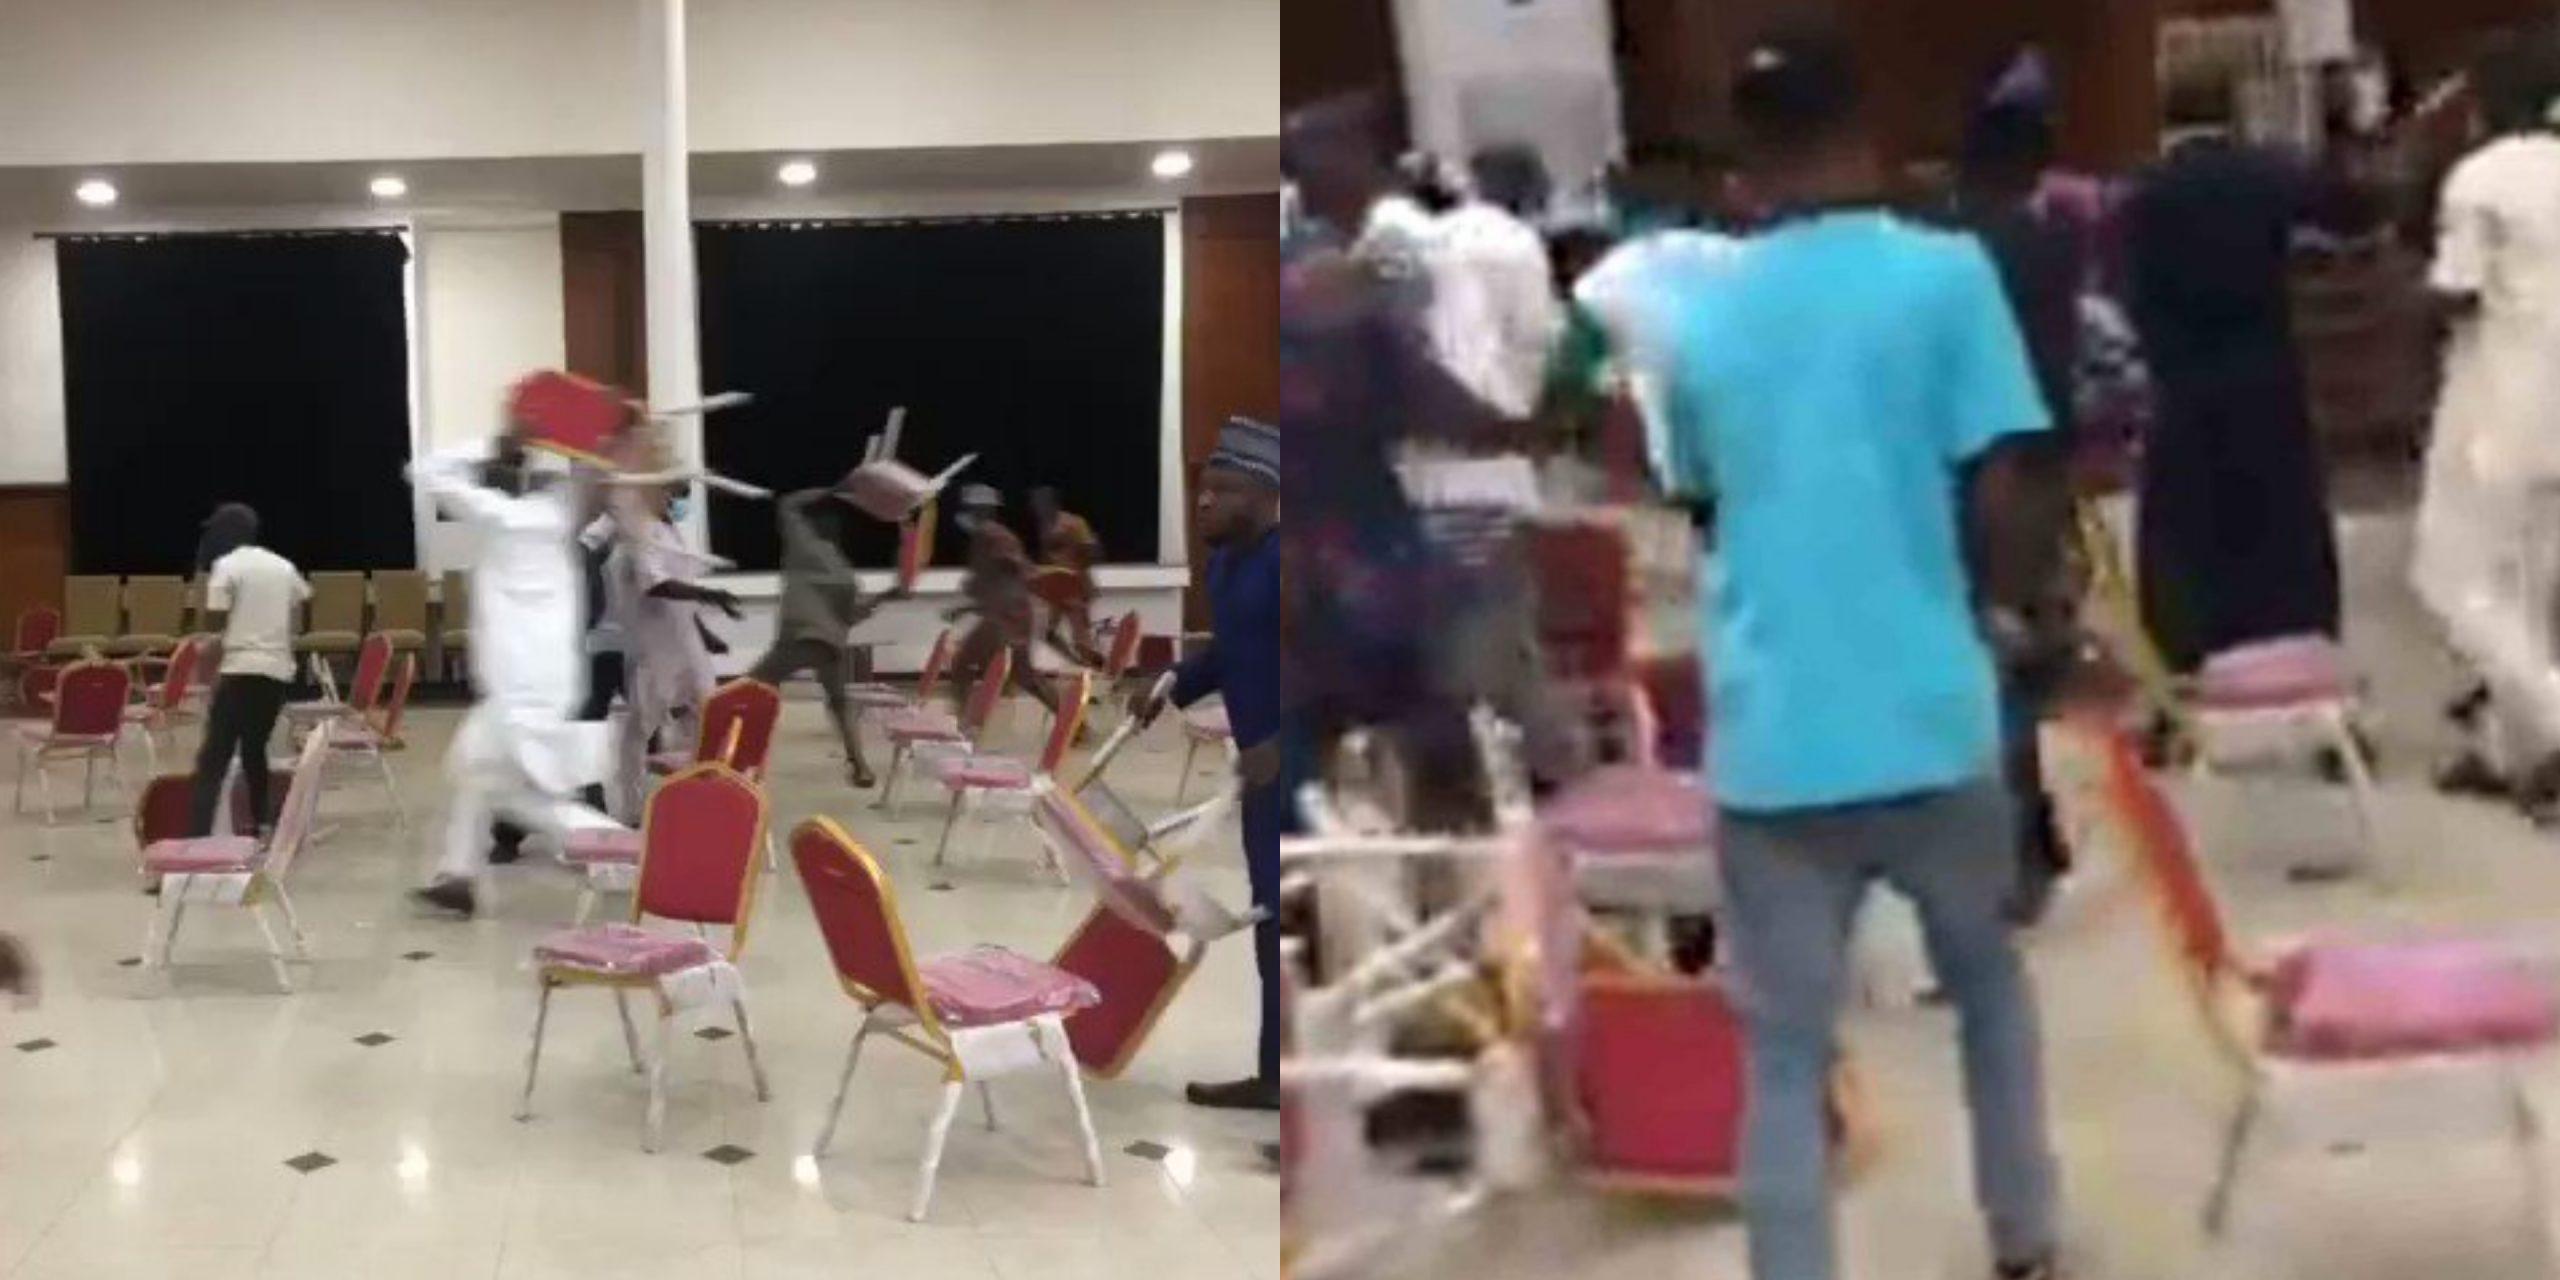 APC Members in Kwara Fights with chair during Membership Registration (Video)